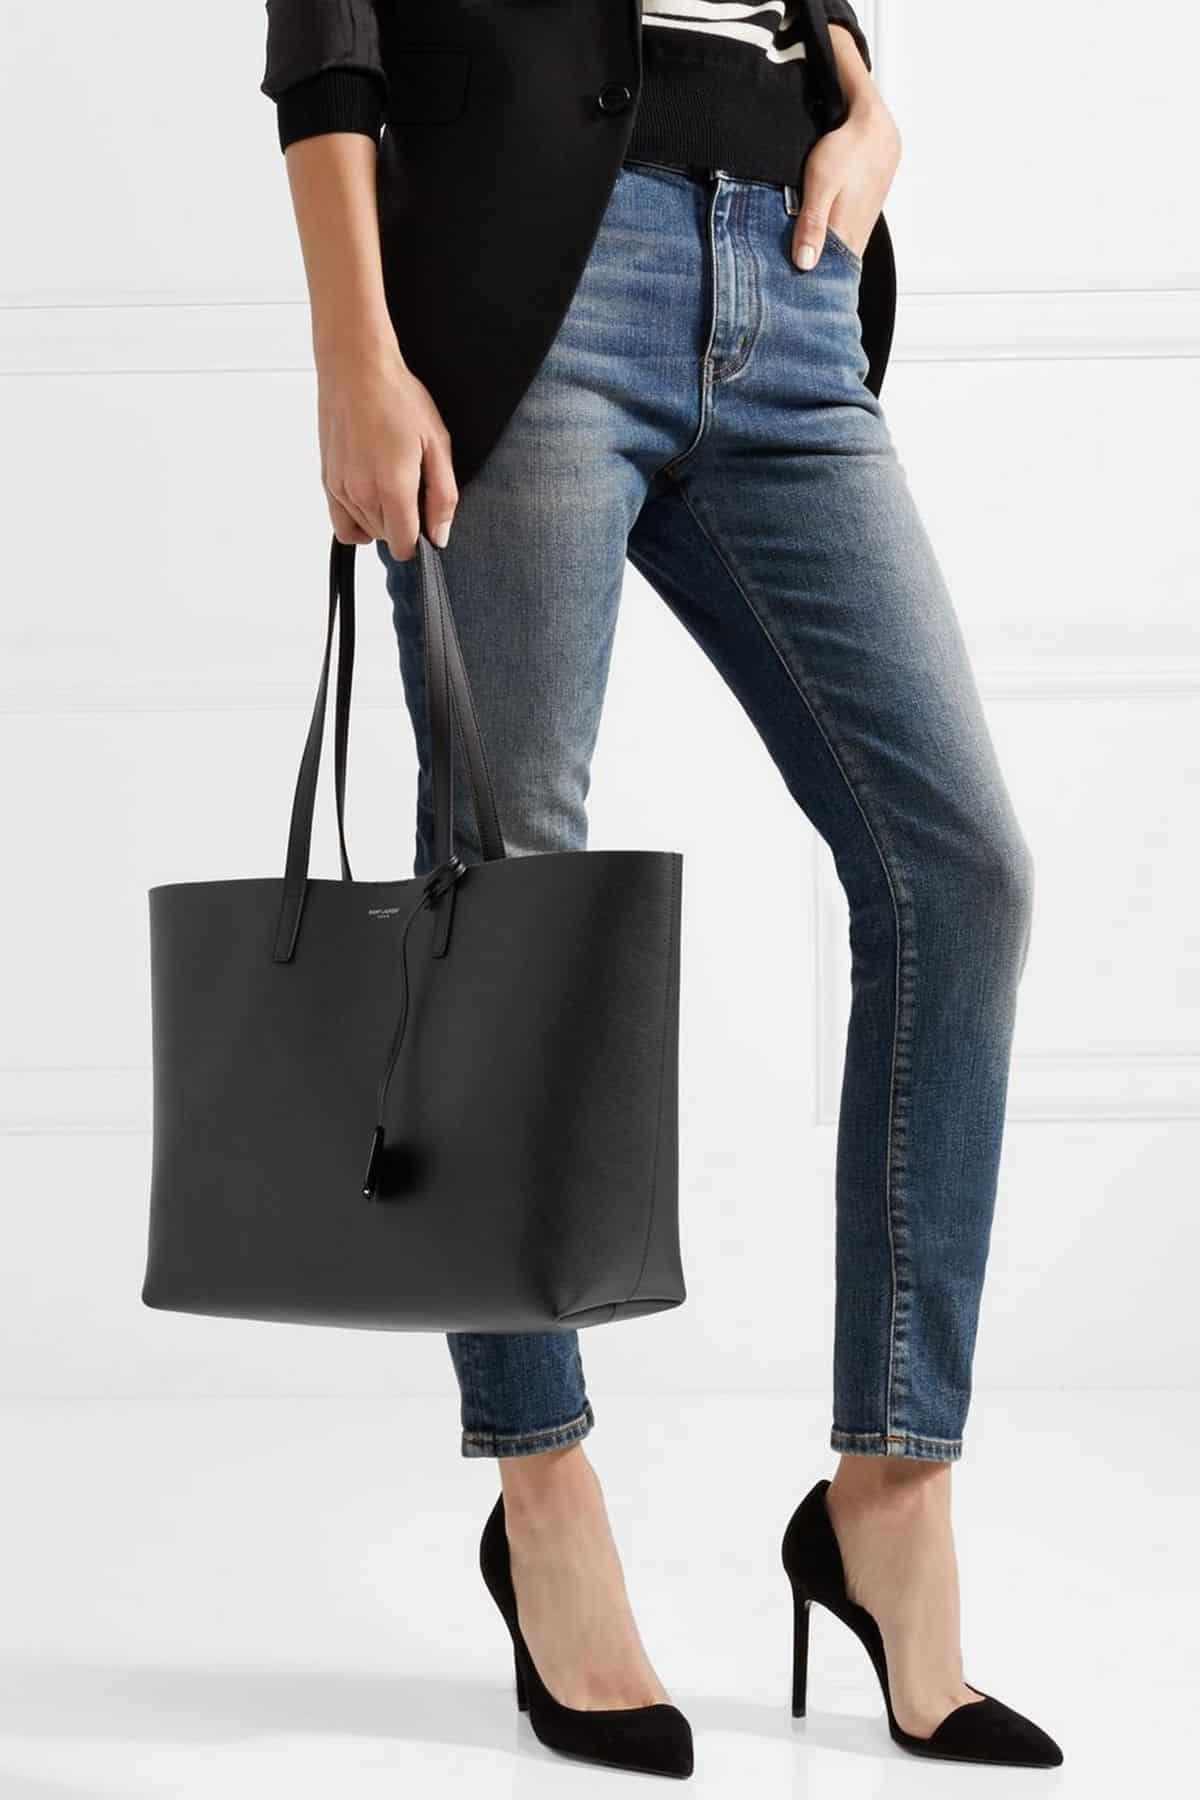 Yves Saint Laurent Leather Shopping Bag